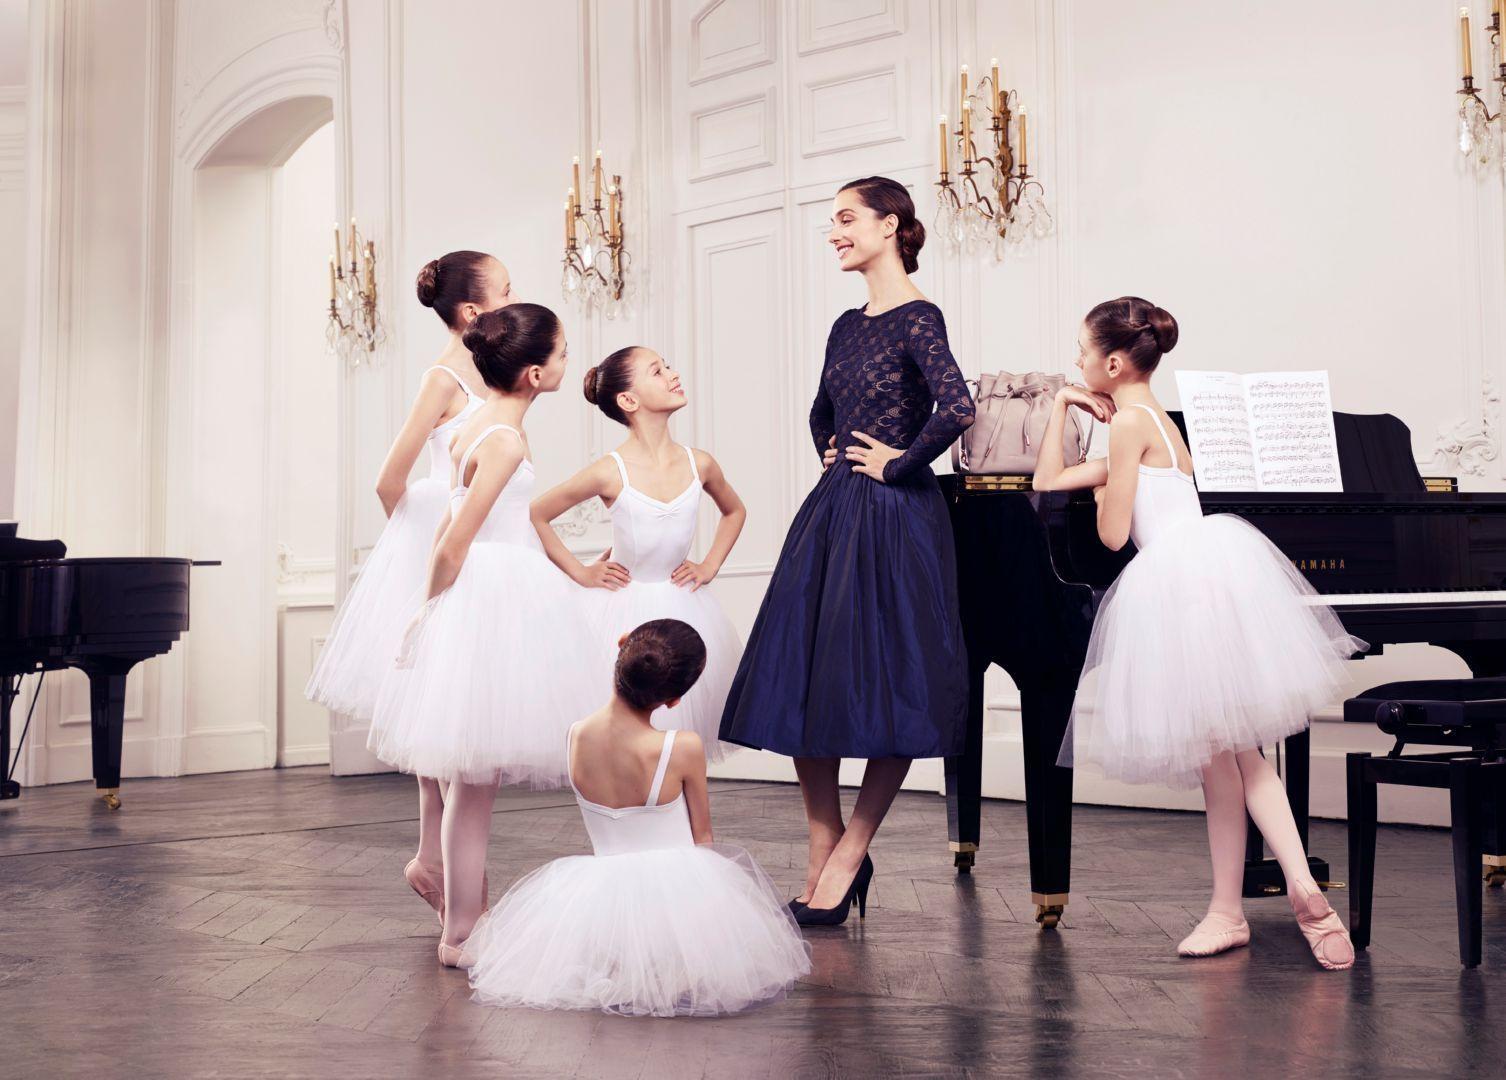 The Discipline of Dance